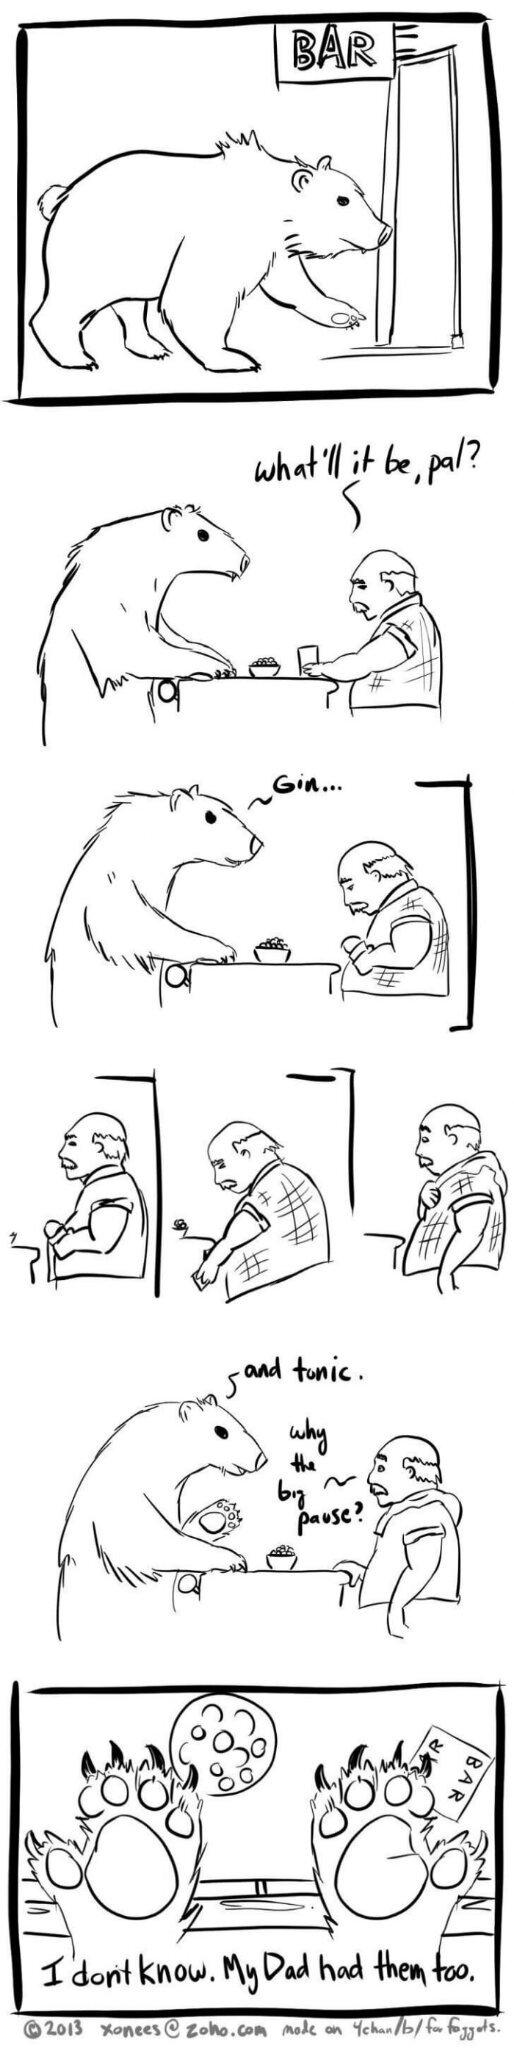 Why the big dick? - meme